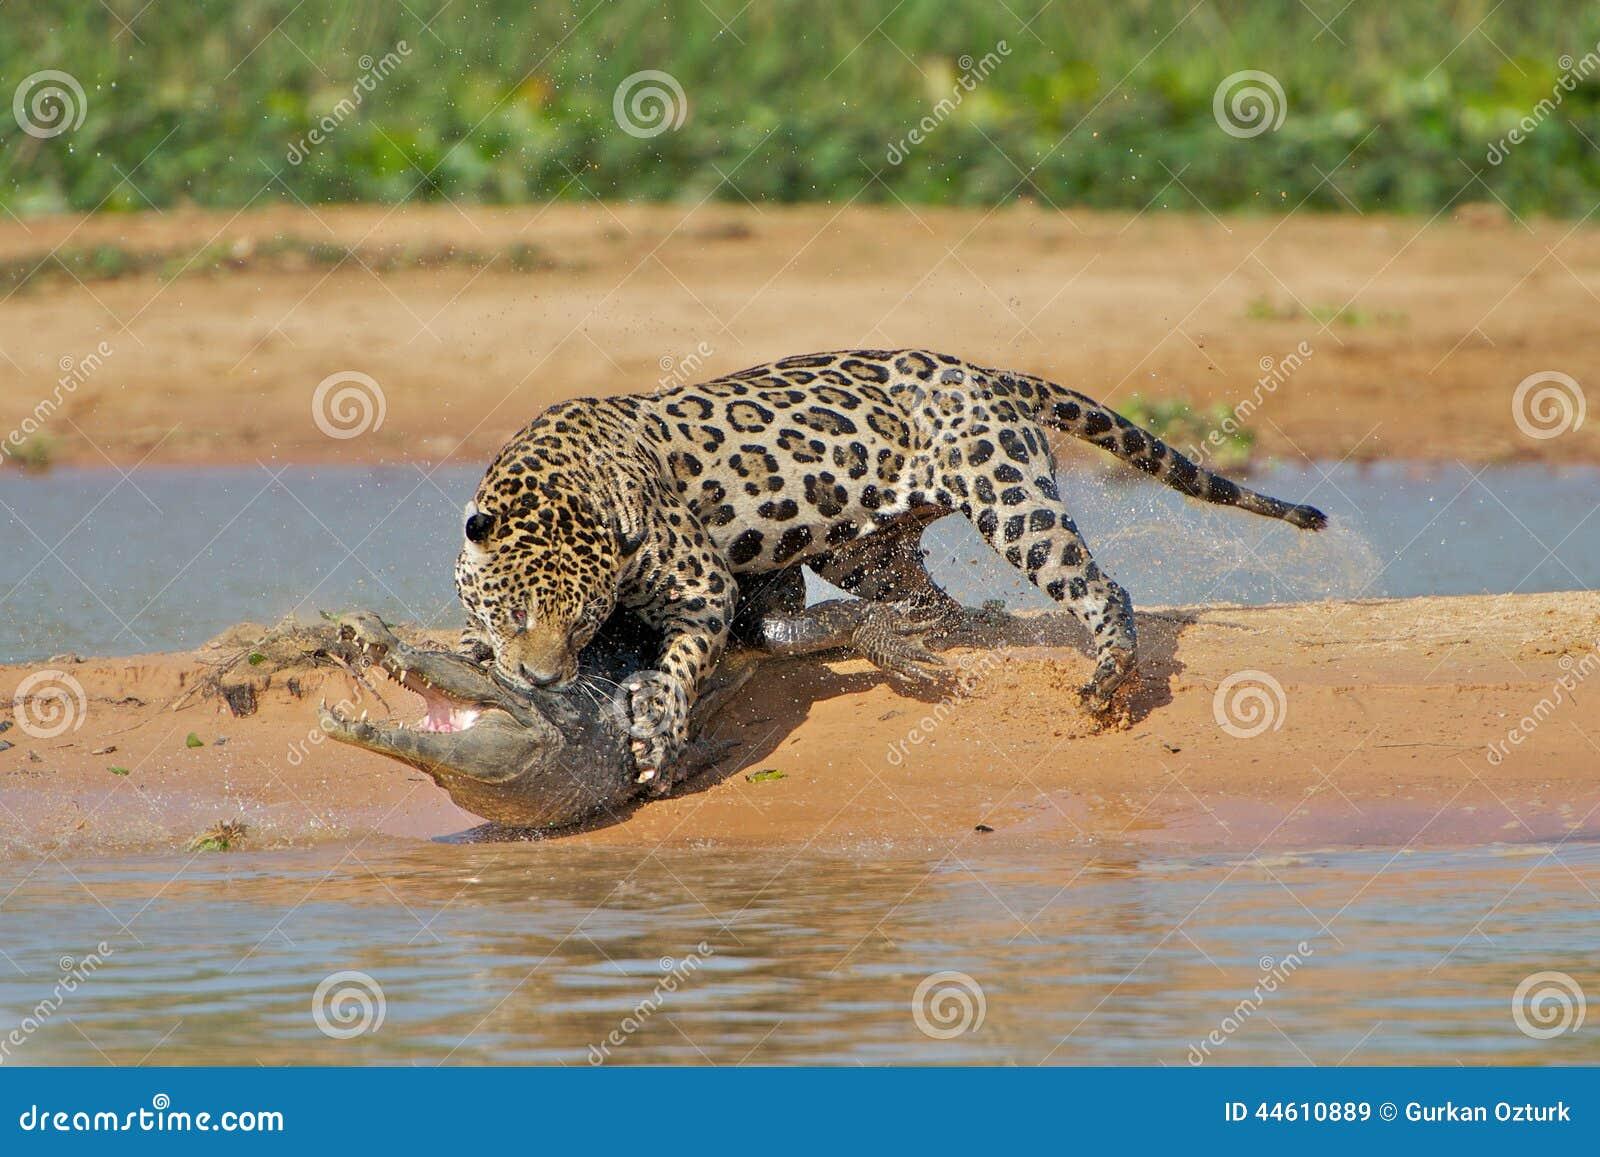 Jaguar Attacks Crocodile Cousin (EXCLUSIVE VIDEO ...